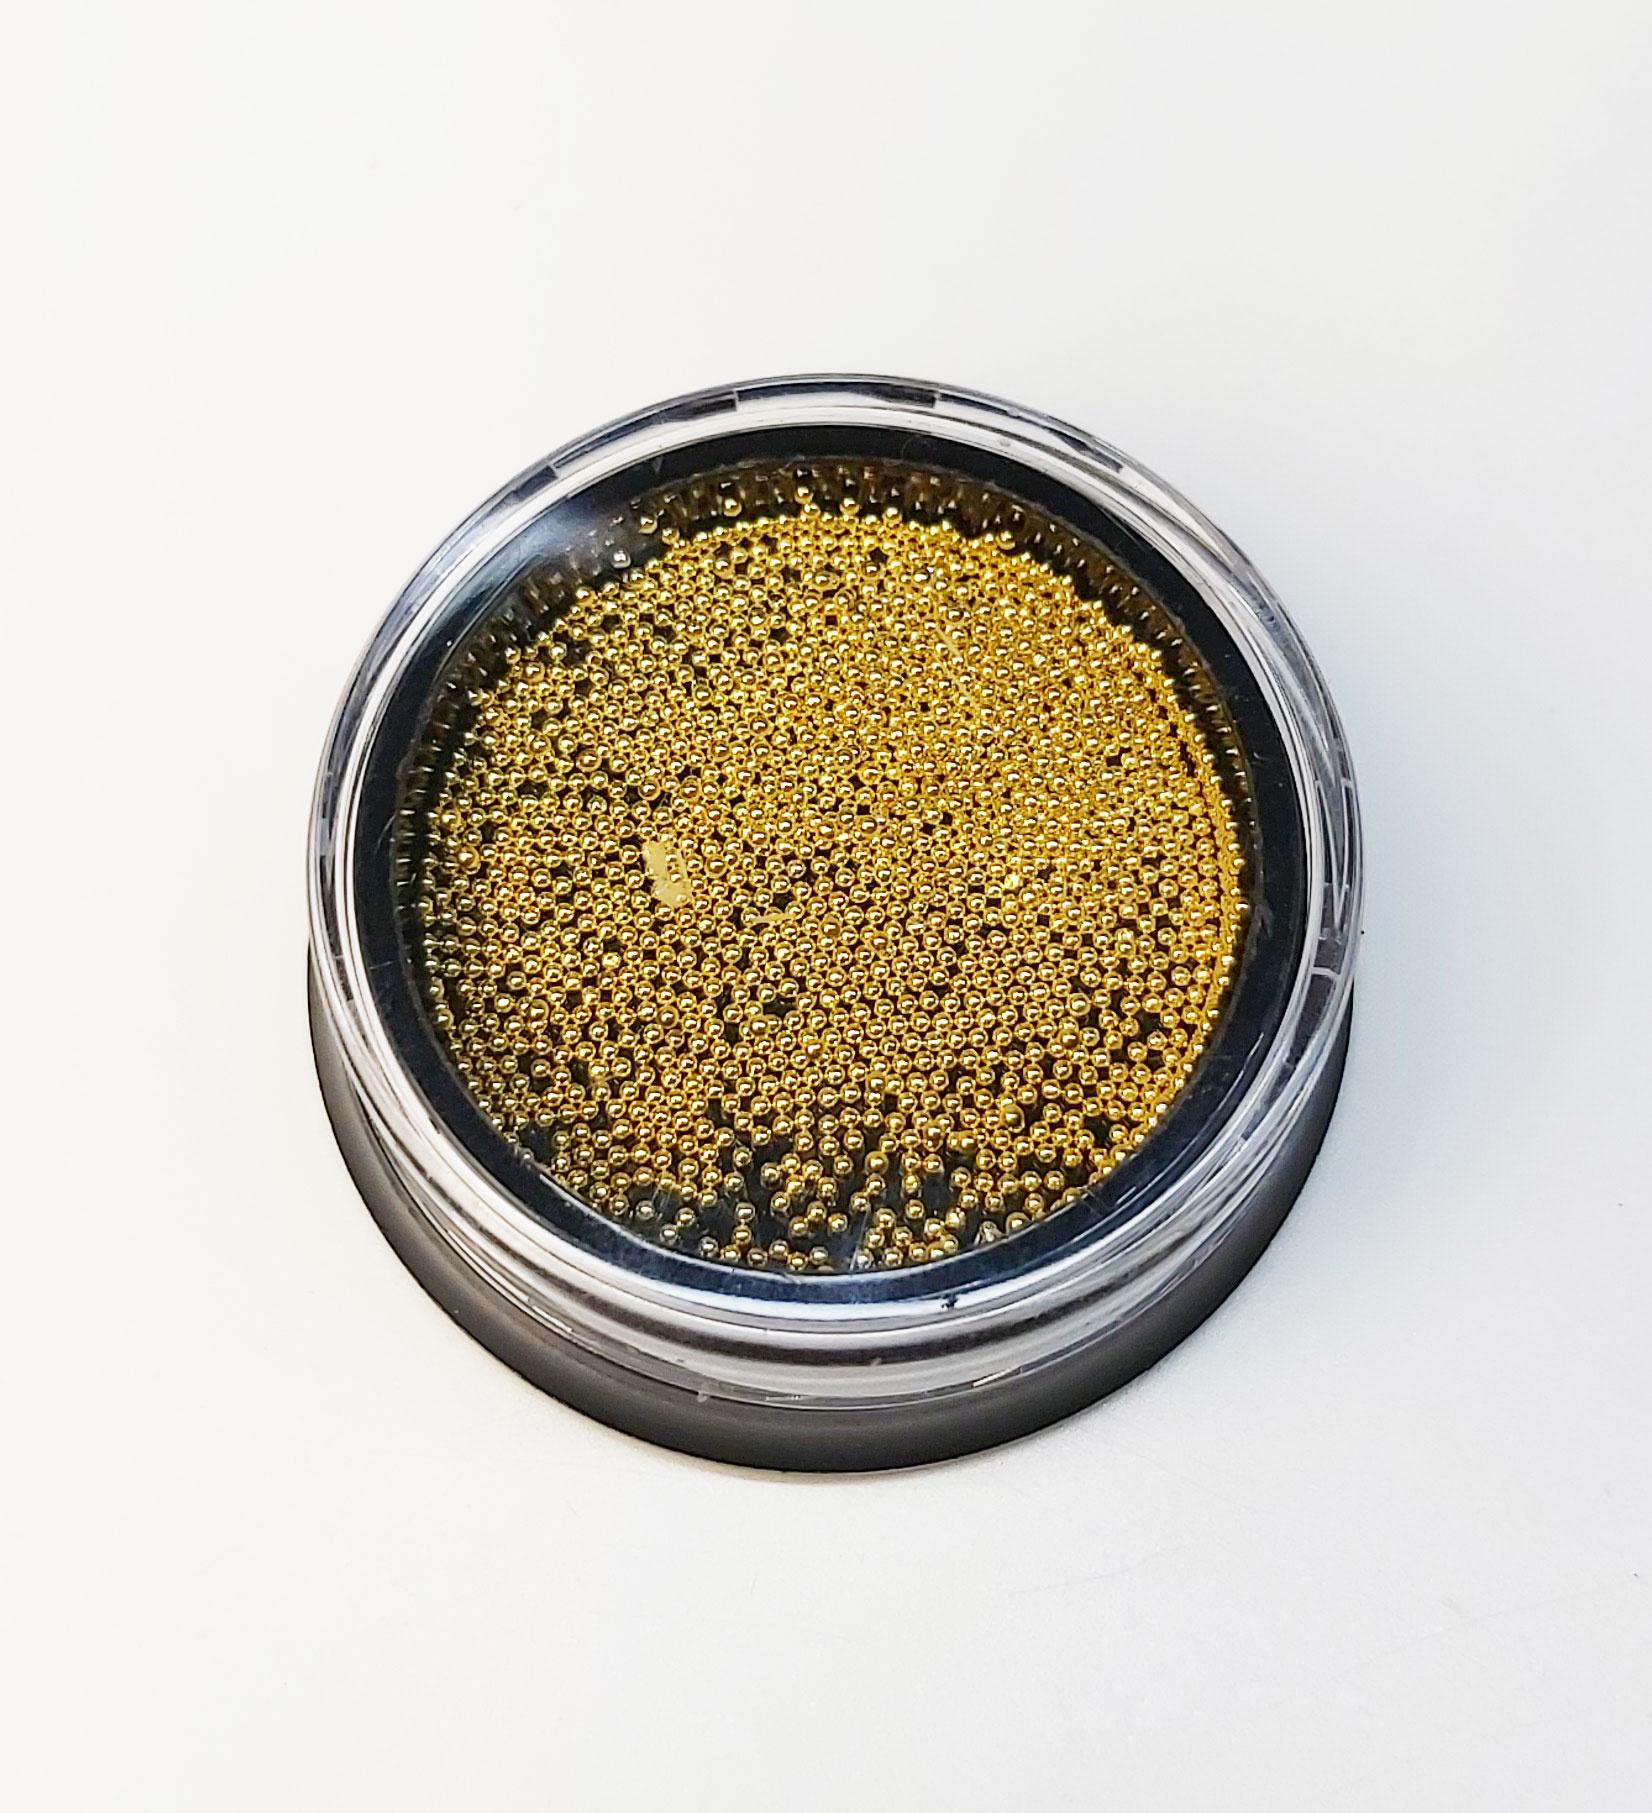 Gold. Mikroperlen 0,6mm. Edelstahl